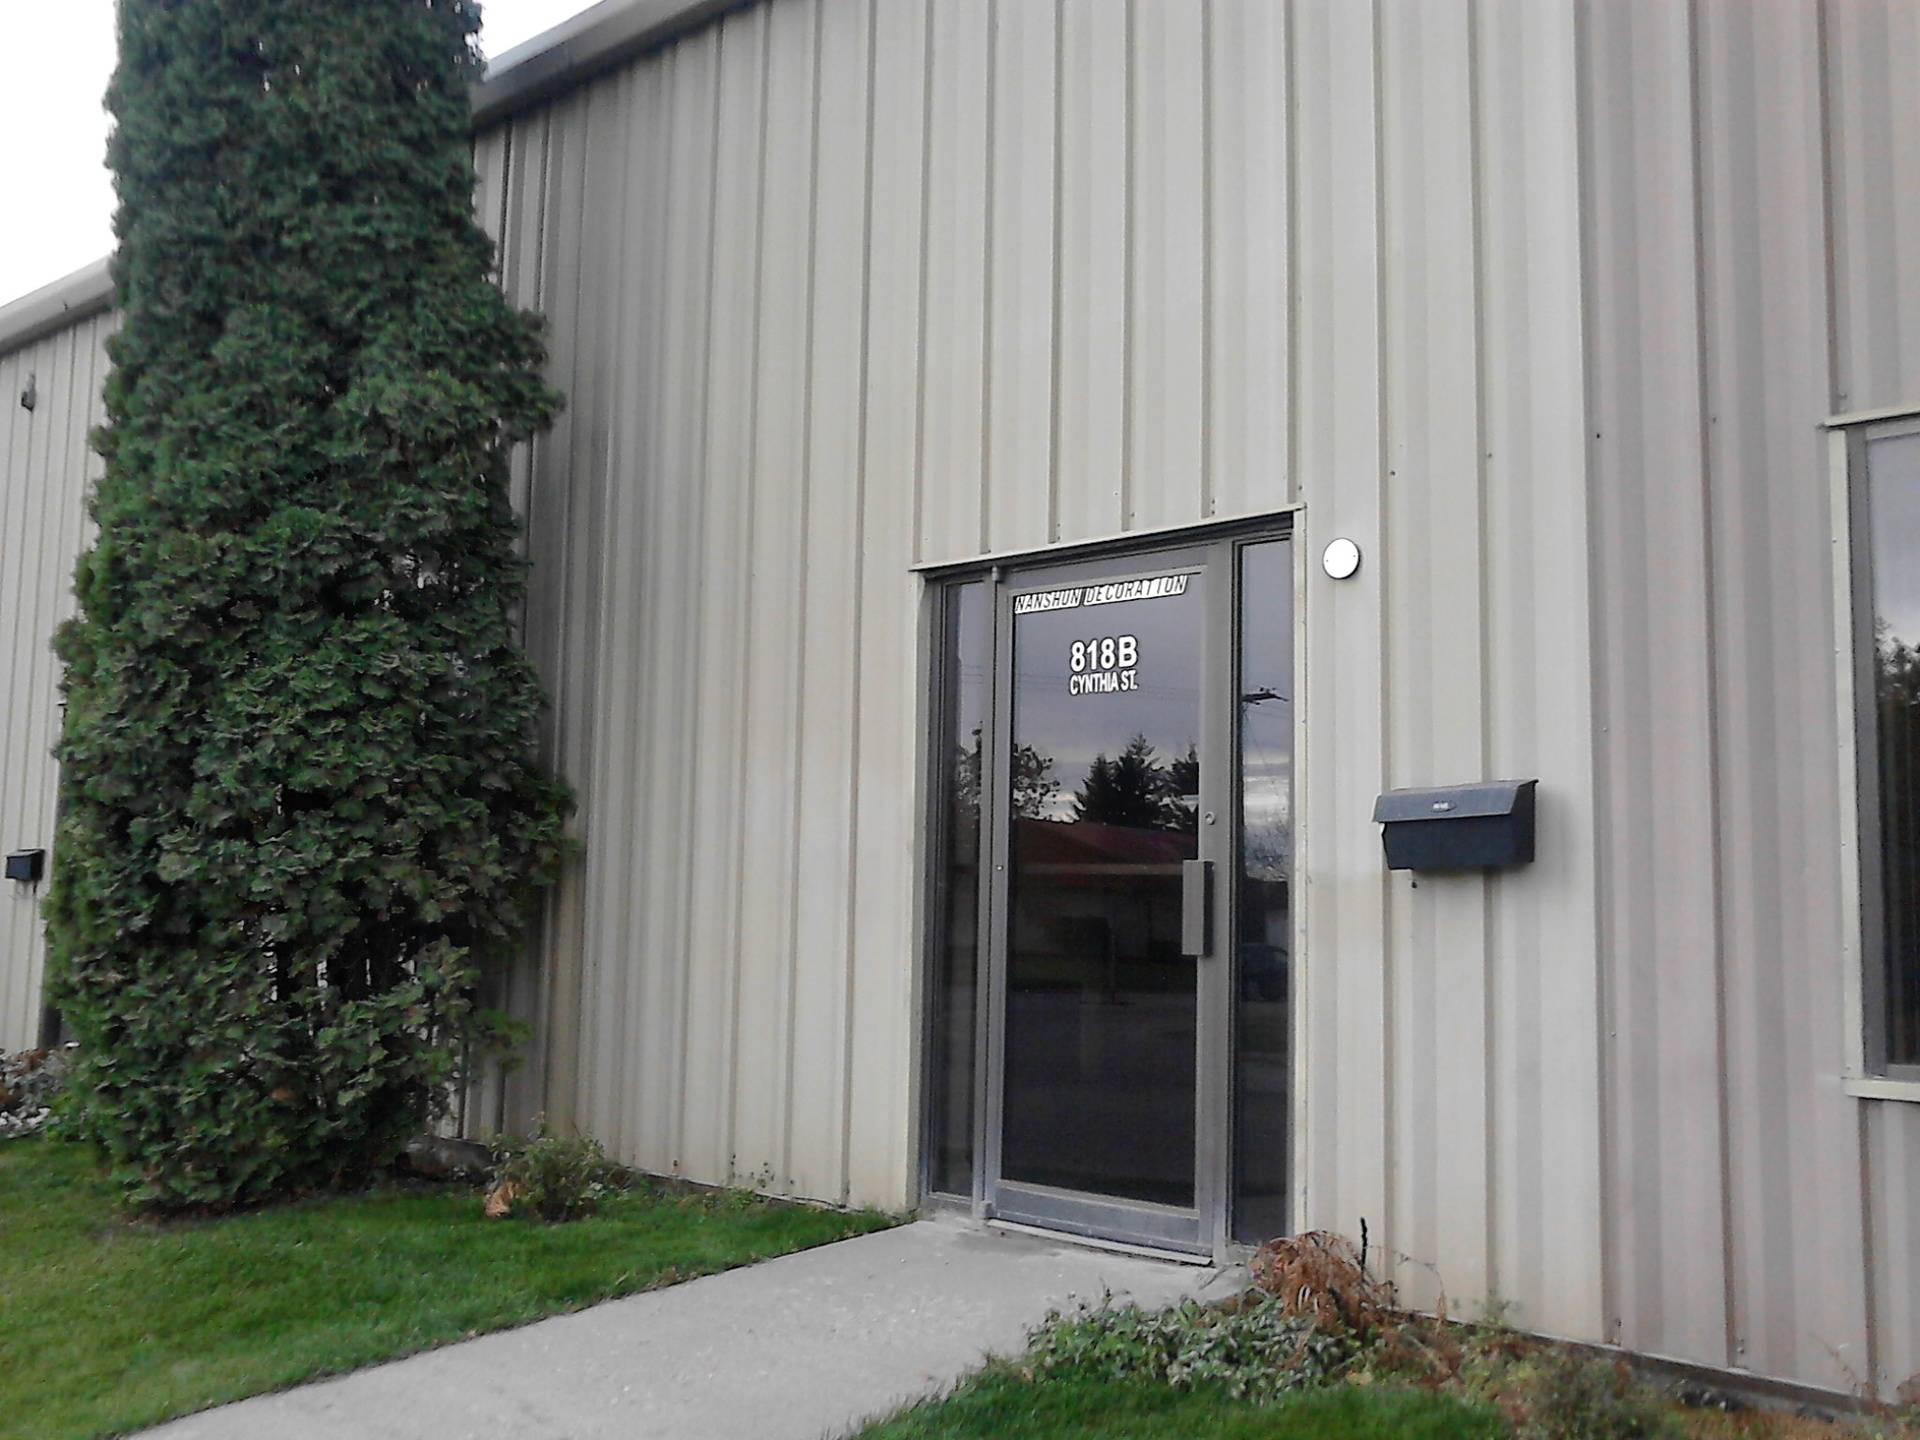 NANSHUN DECORATION MATERIAL INC., 818B CYNTHIA STREET, SASKATOON, Saskatchewan, S7L 5Z7, Canada